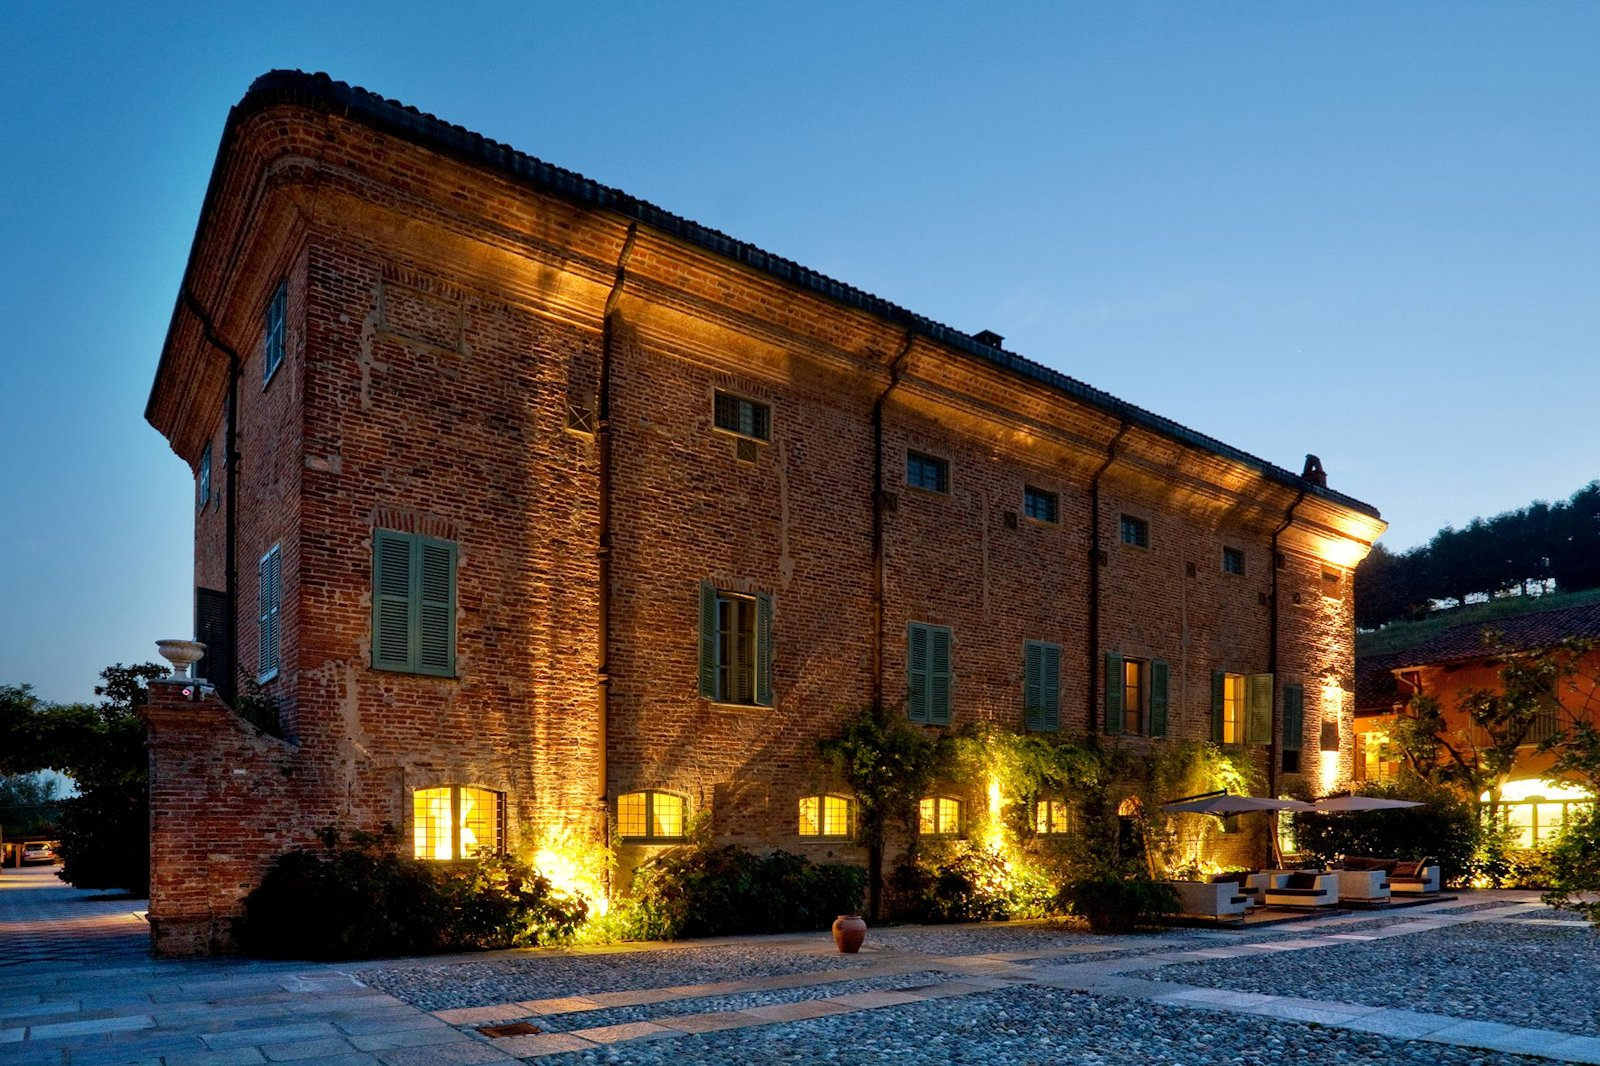 H tel de charme pi mont italie relais del sant 39 uffizio asti for Hotels de charme